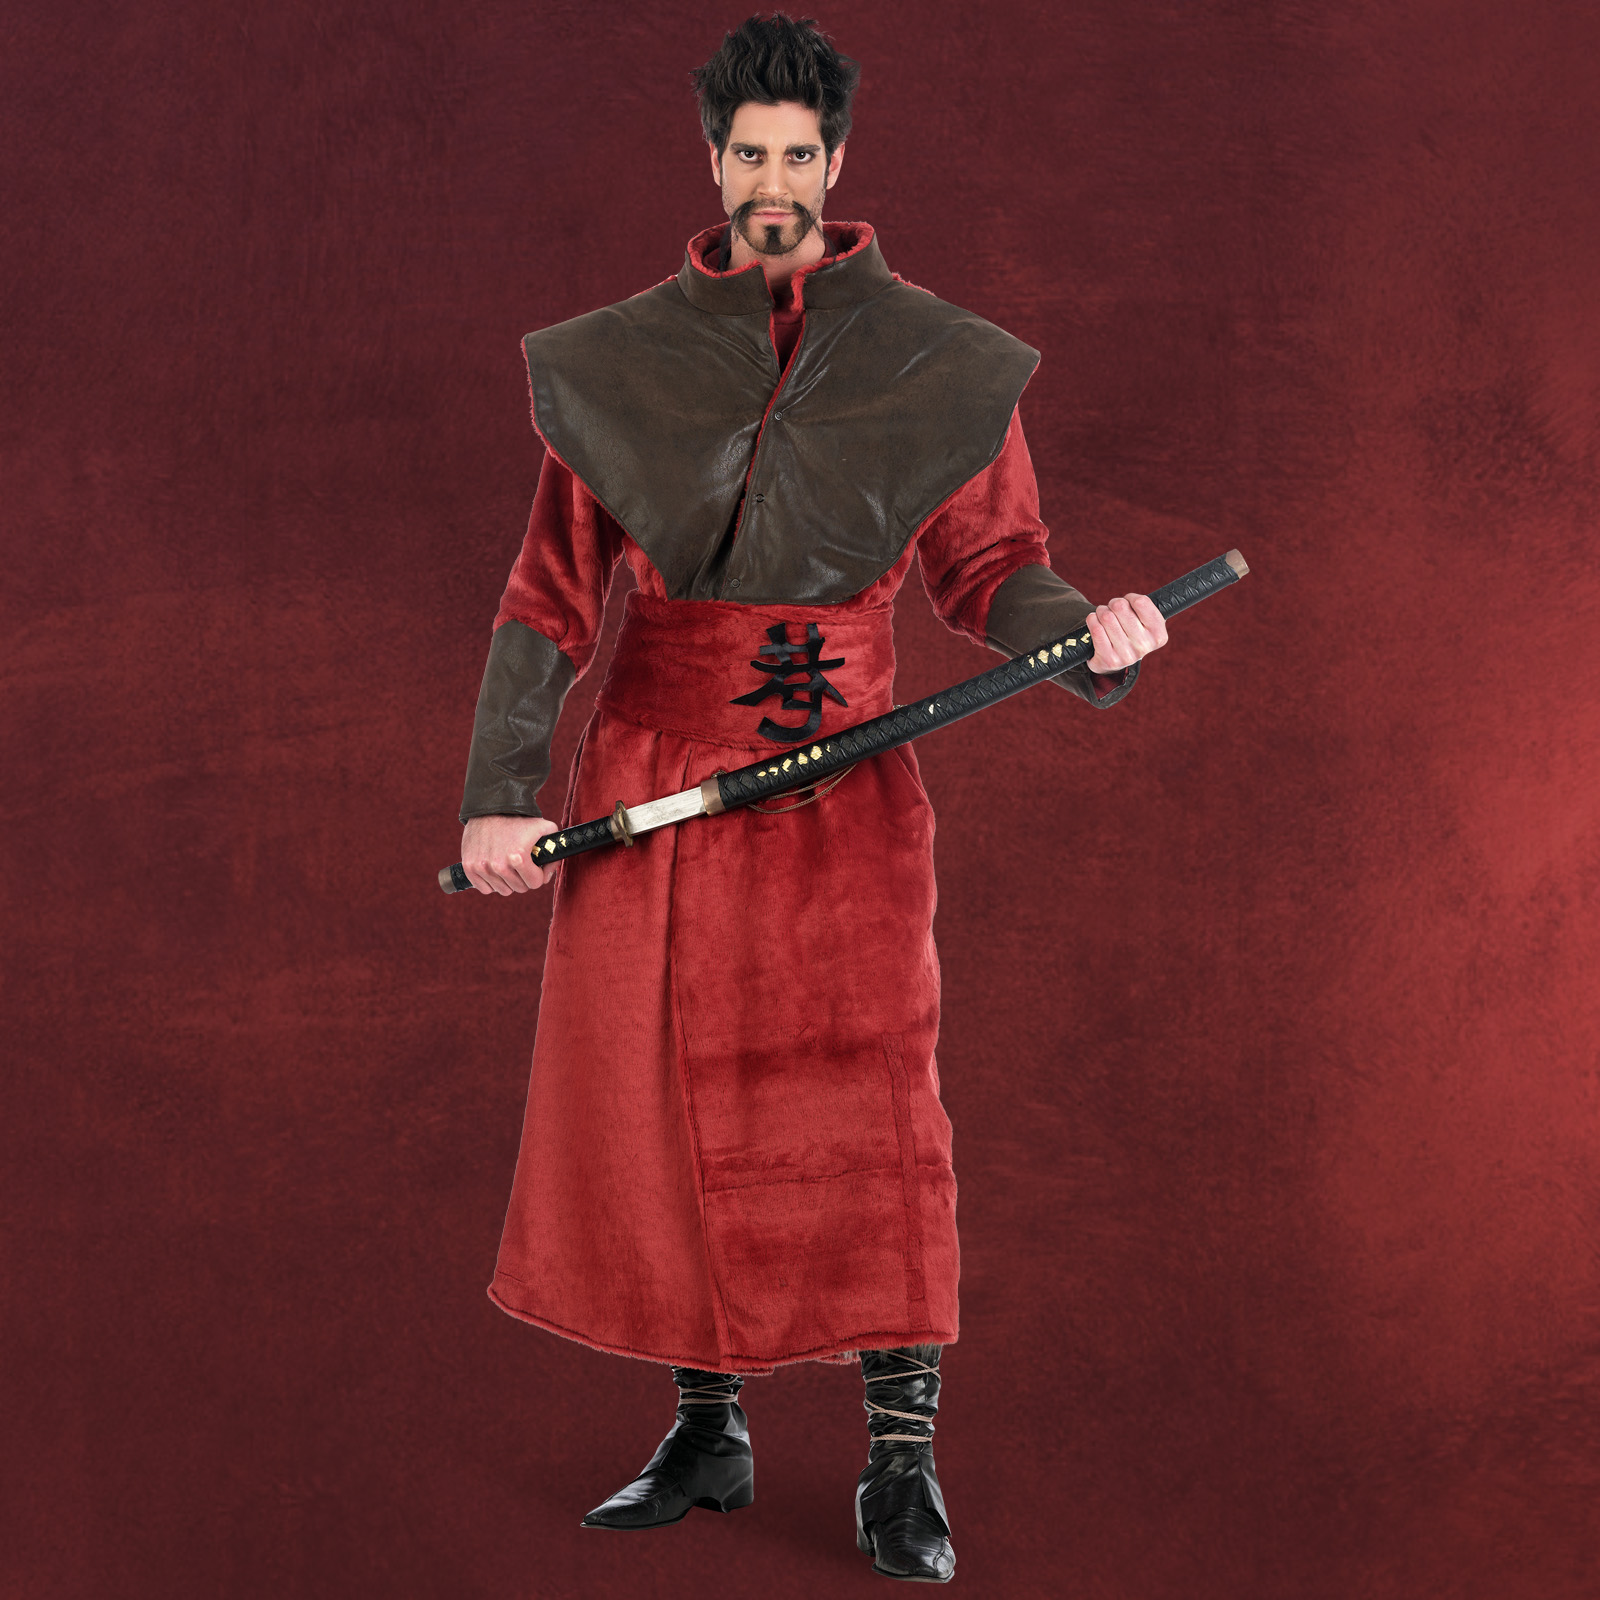 herren fasnachtskost m samurai in ebikon kaufen bei. Black Bedroom Furniture Sets. Home Design Ideas